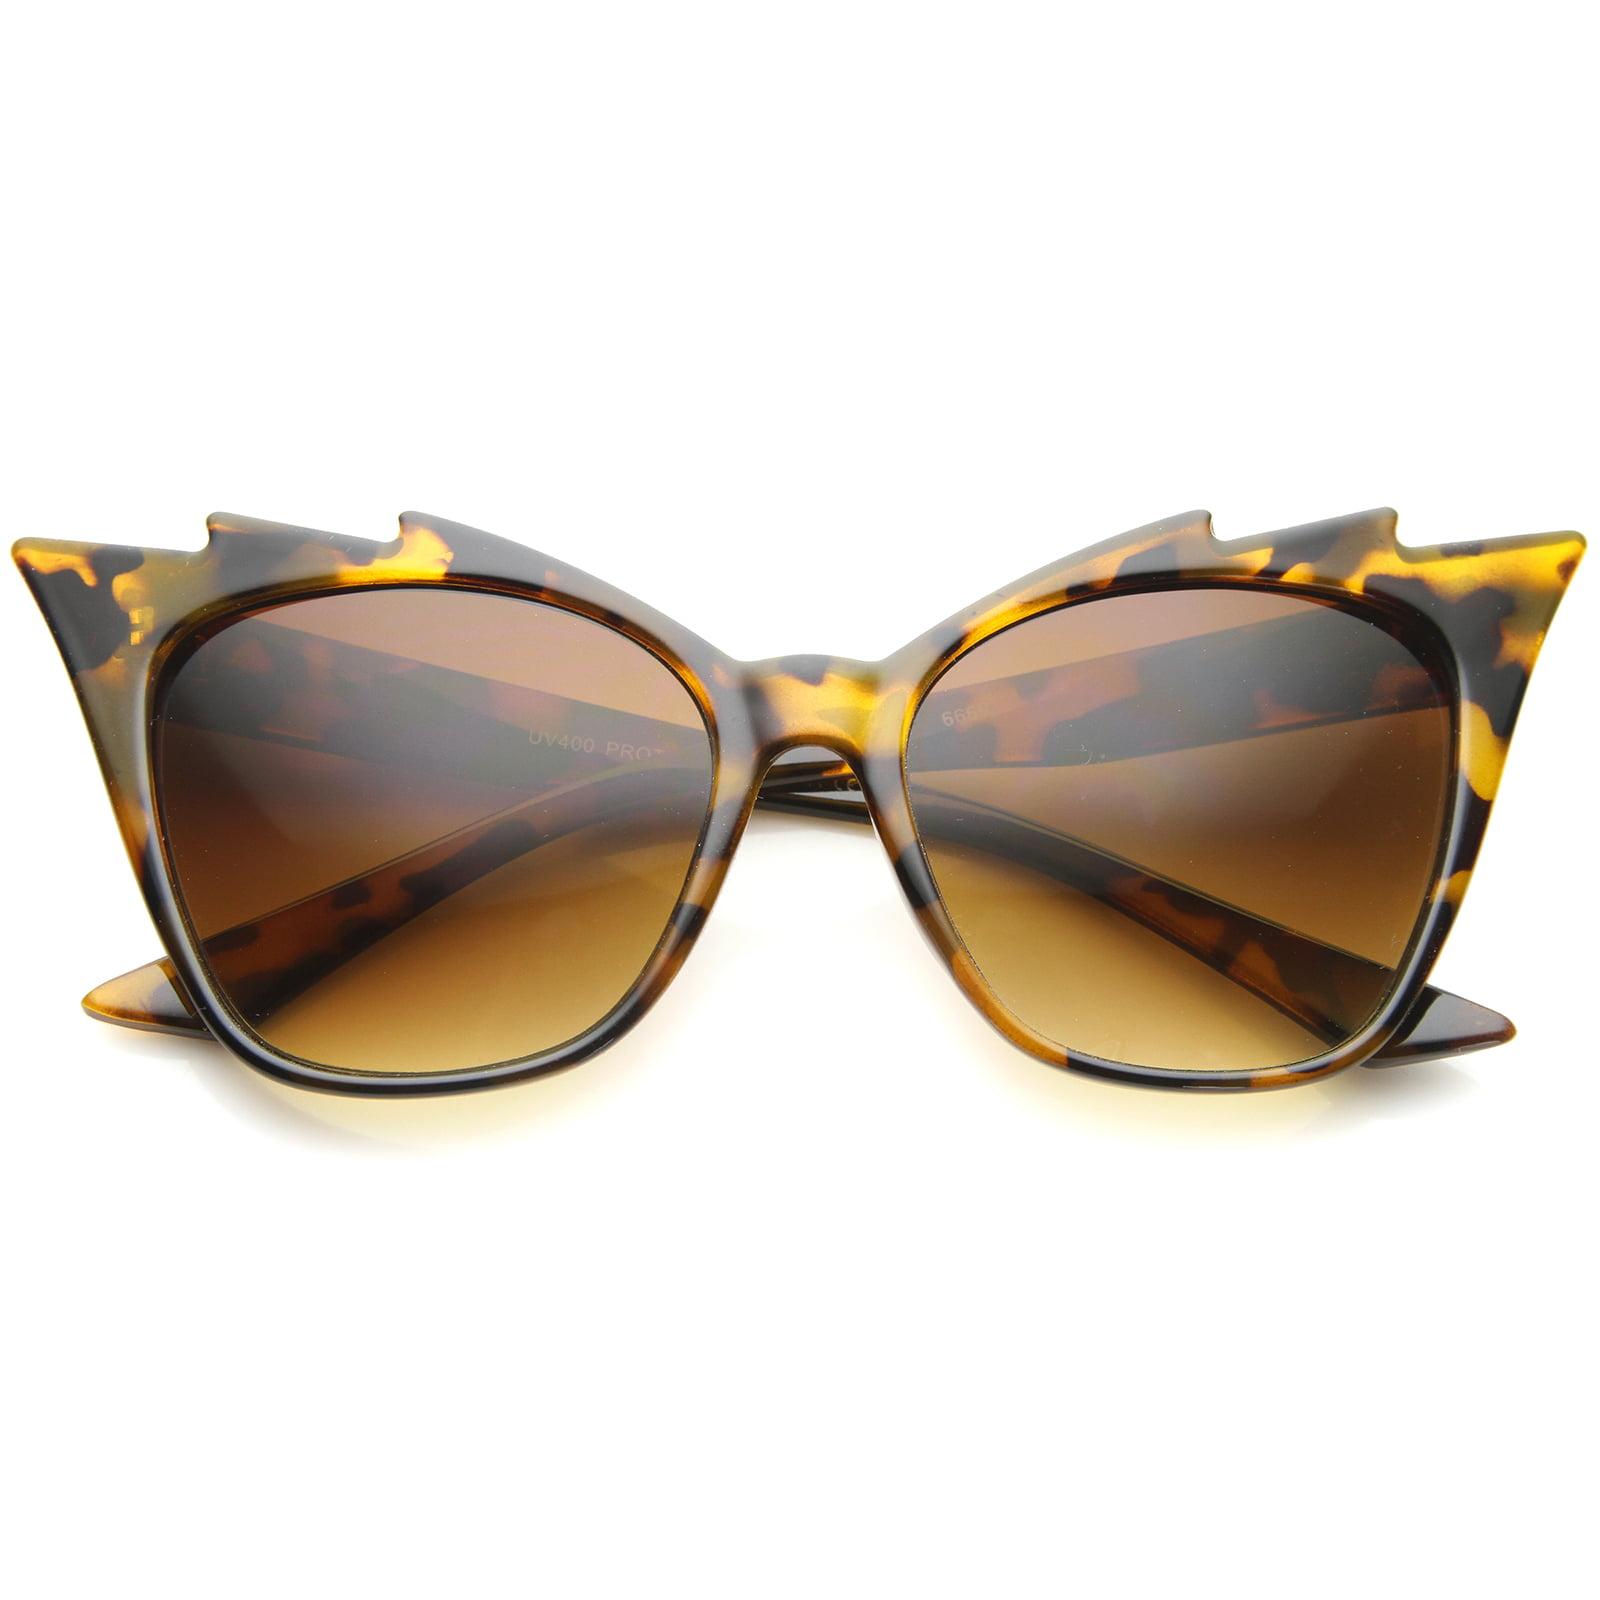 sunglassLA - Womens High Fashion Glam Rock Jagged Edge Staggered Cat Eye Sunglasses - 60mm